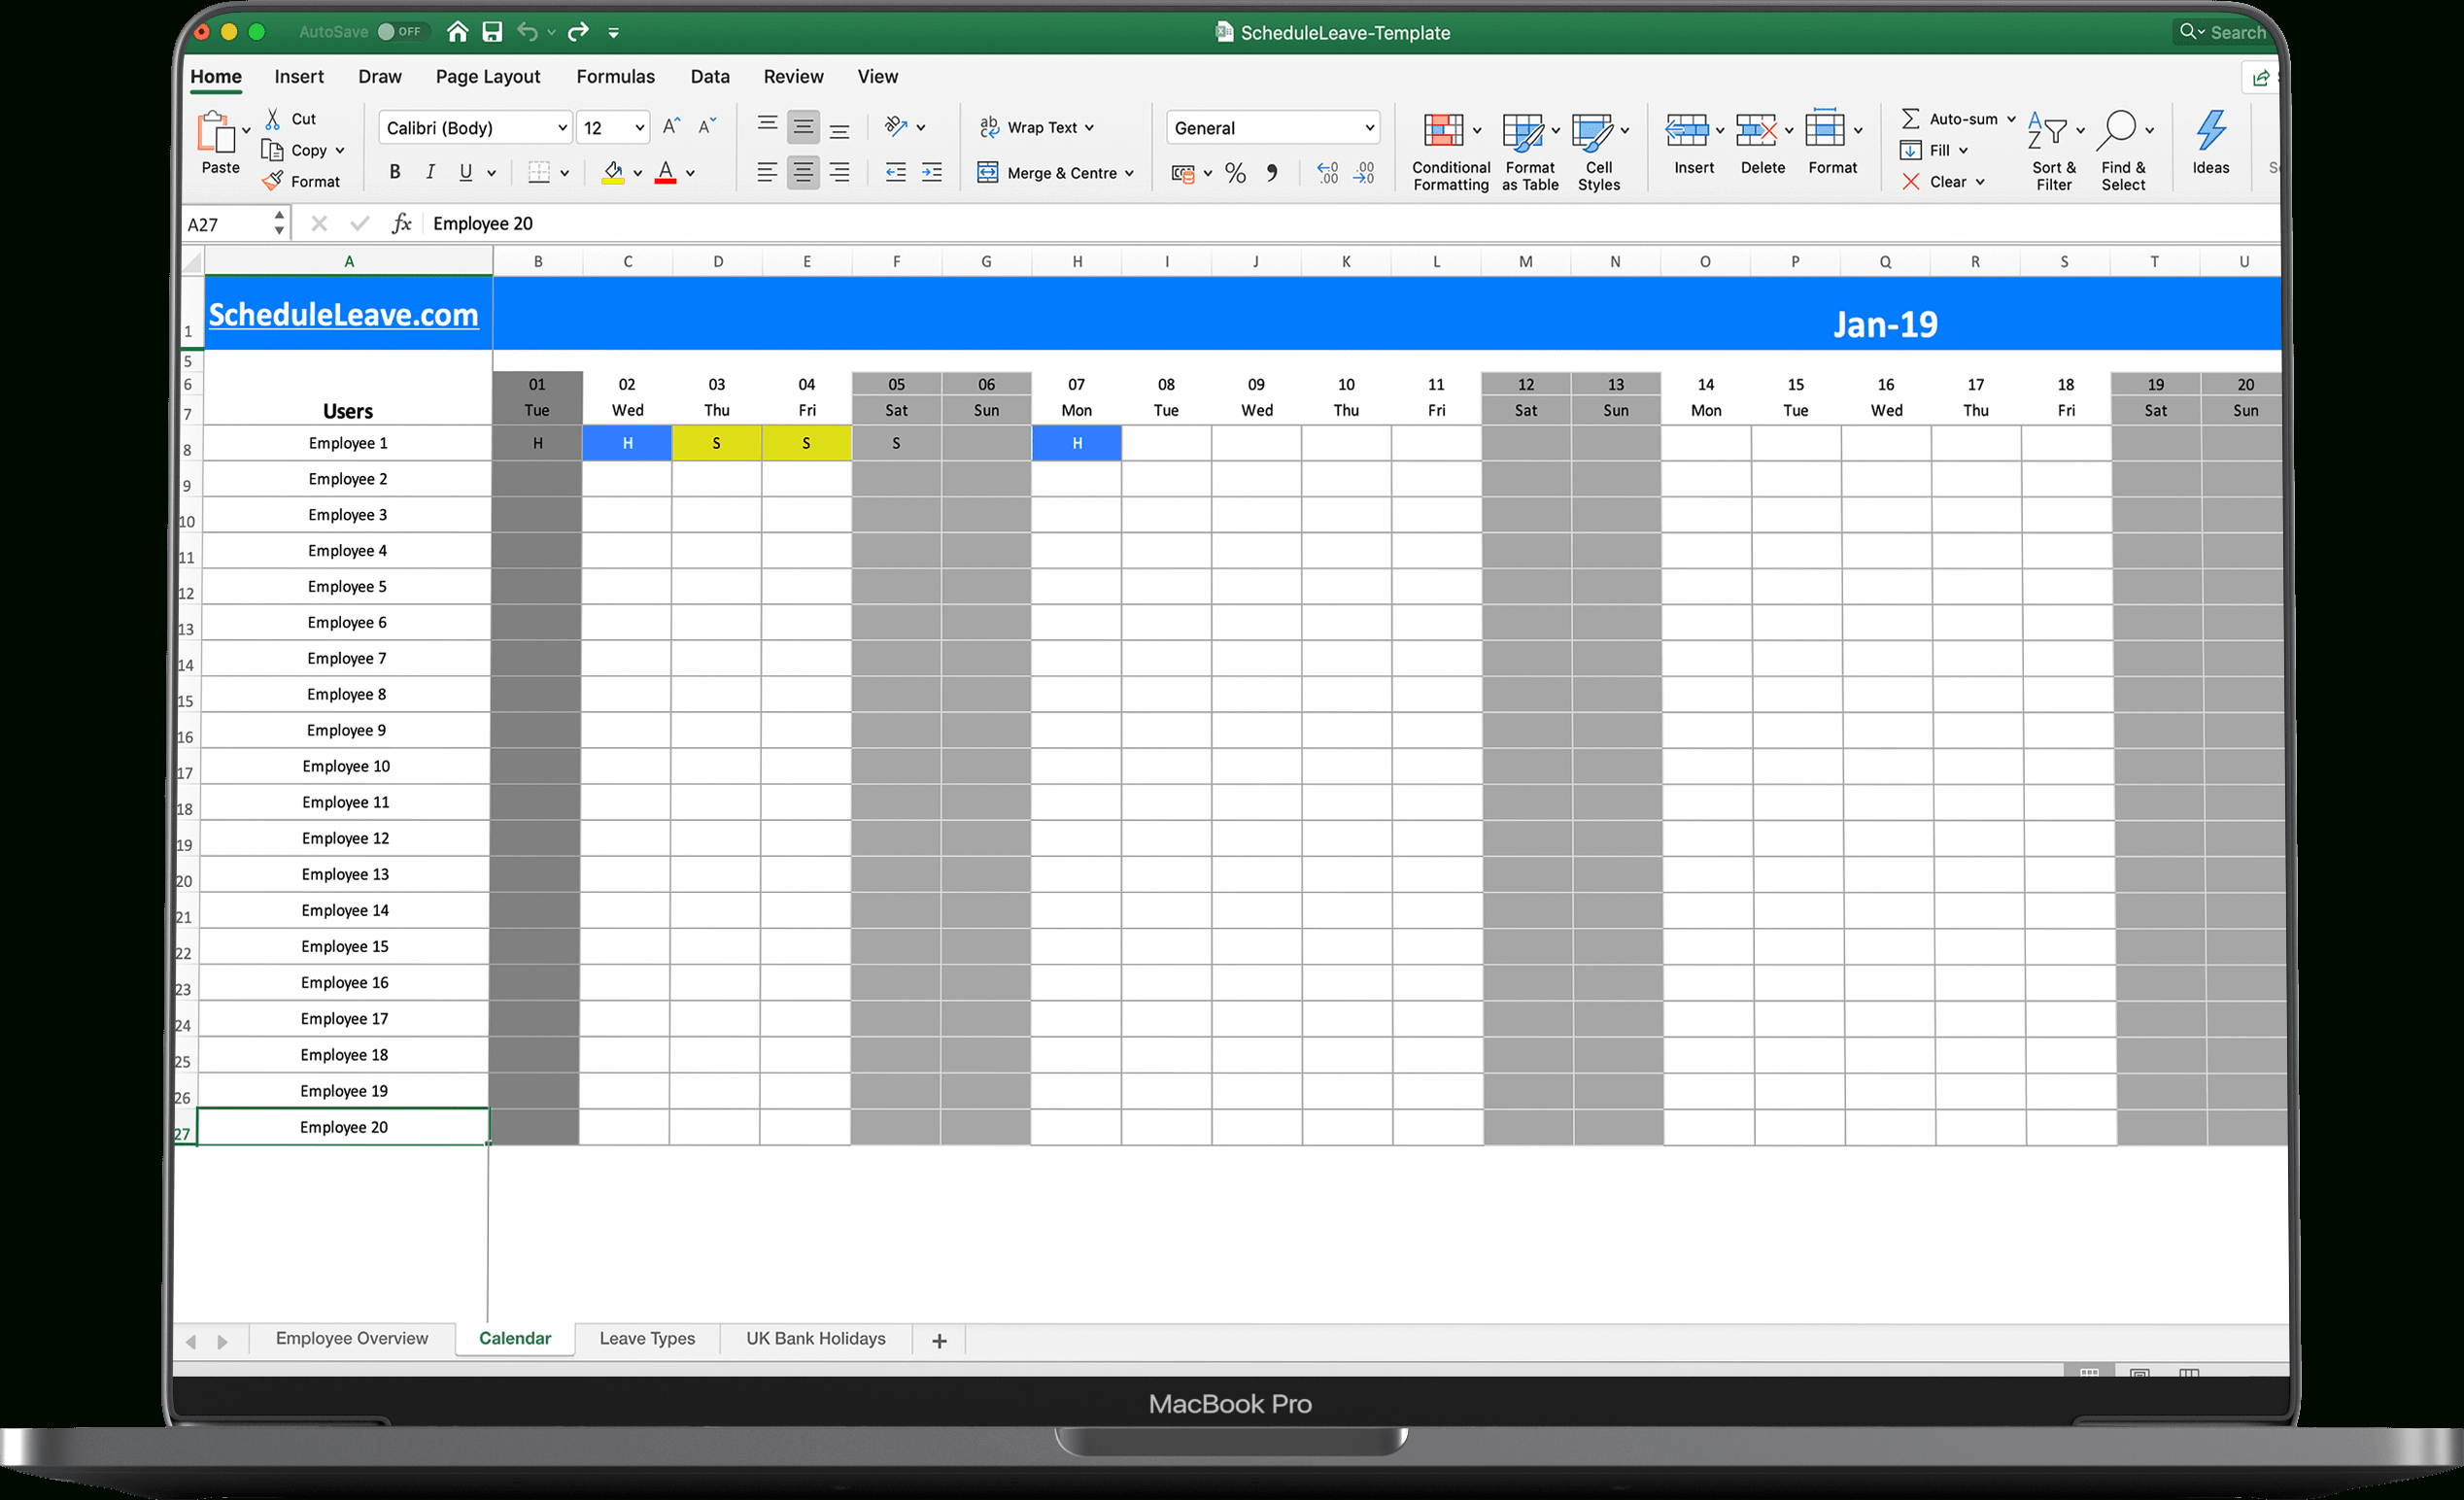 Free Excel Leave Calendar 2021 Spreadsheet Template-2021 Employee Vacation Calendar